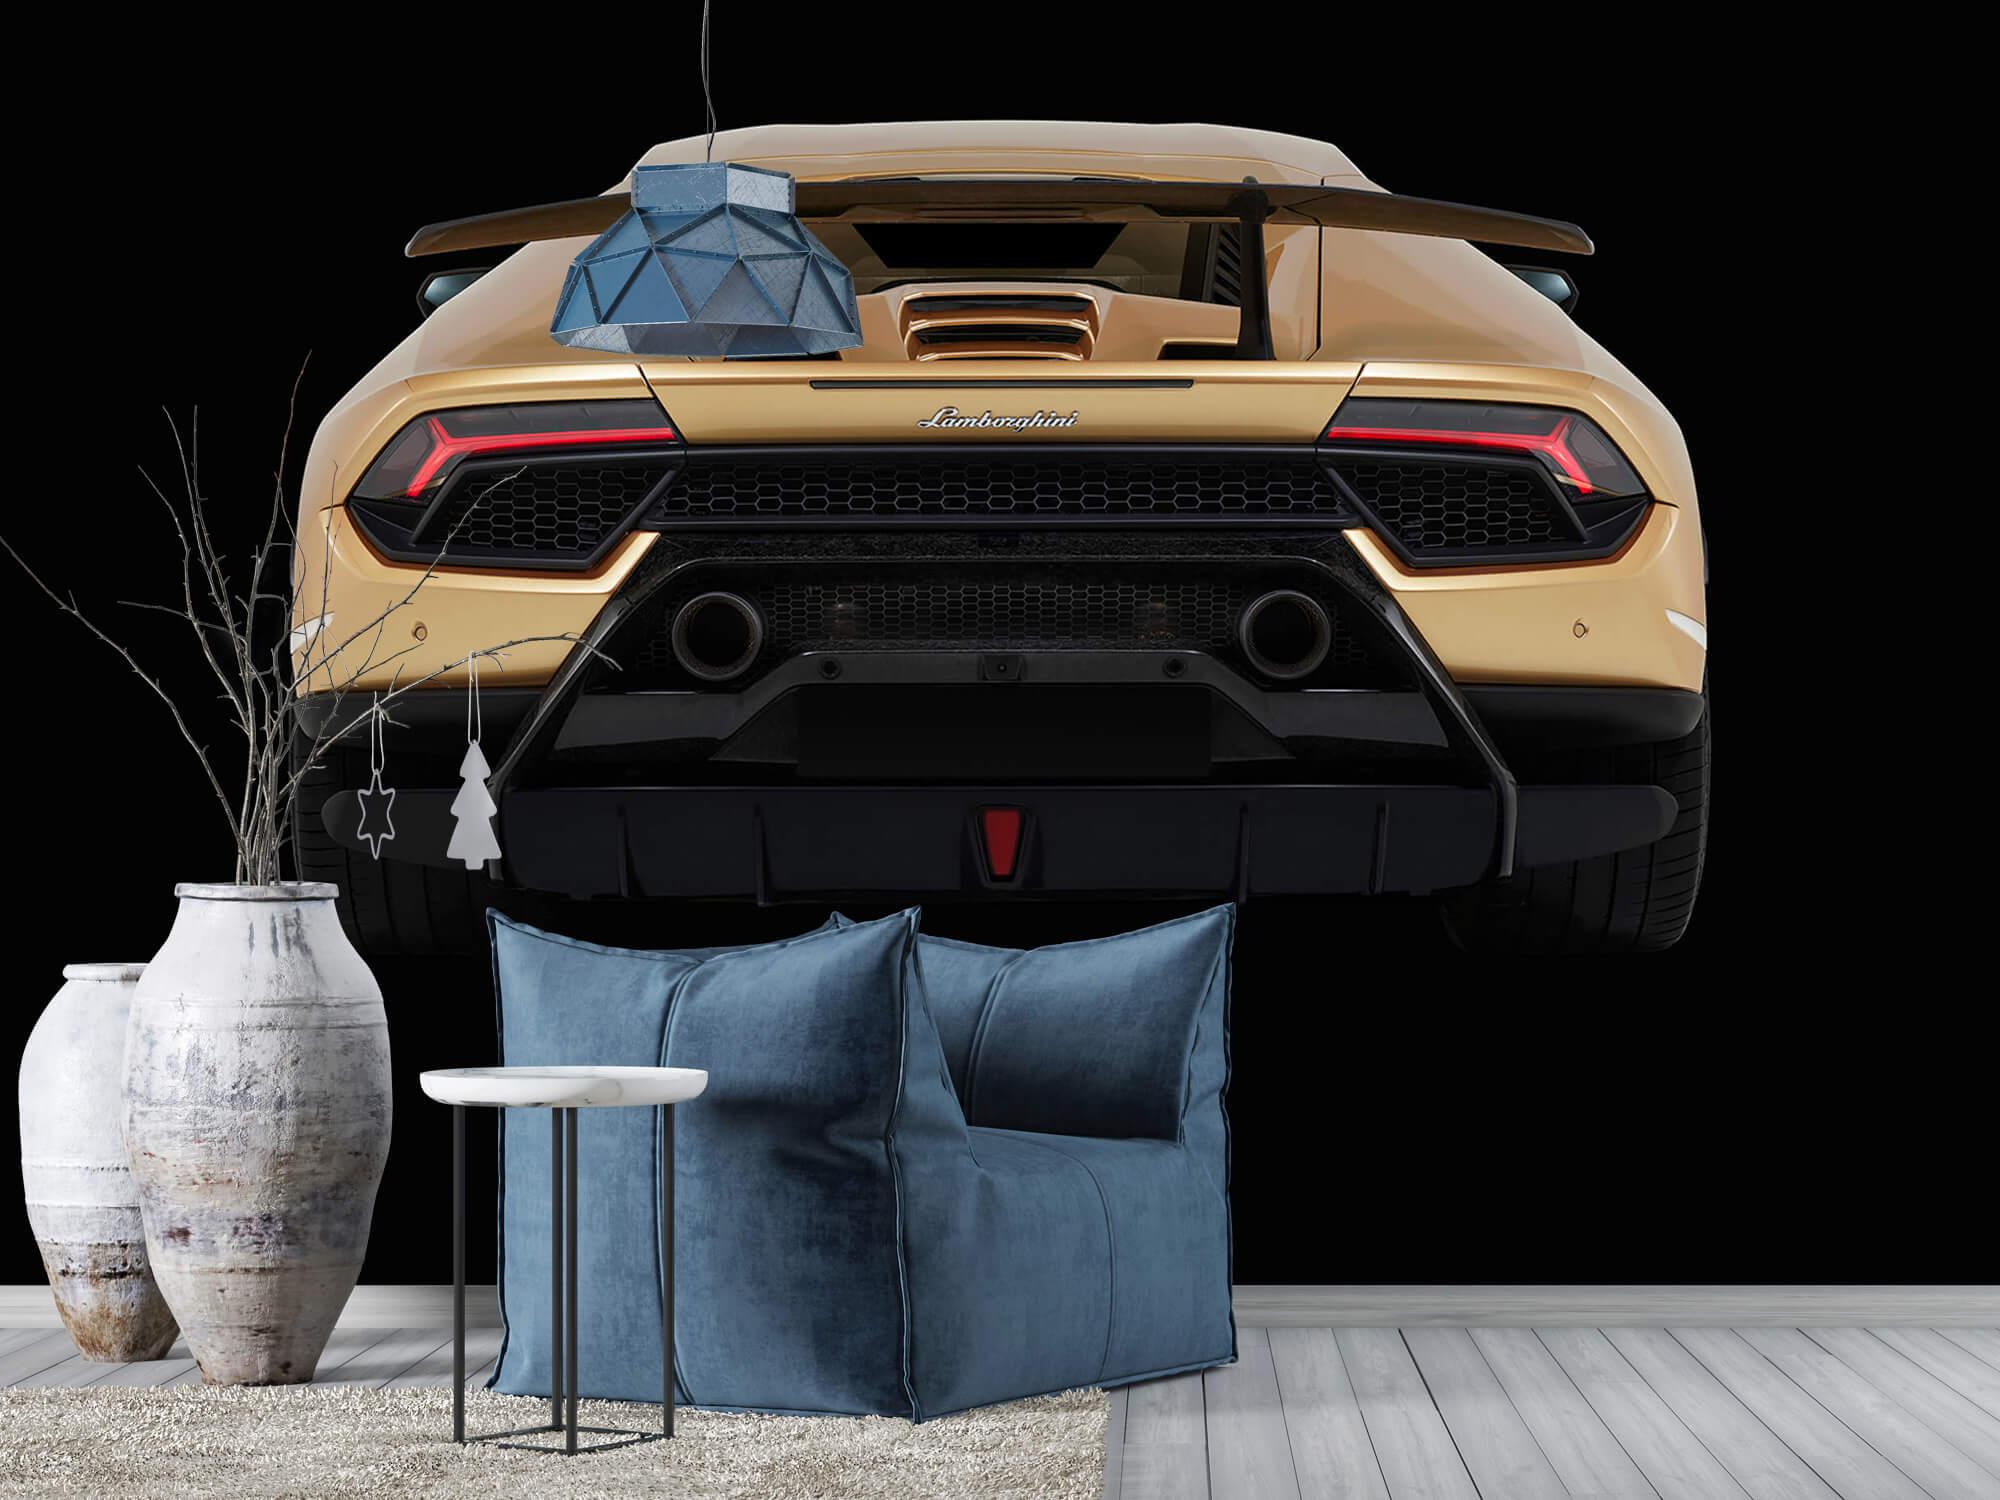 Wallpaper Lamborghini Huracán - Rear view, black 8